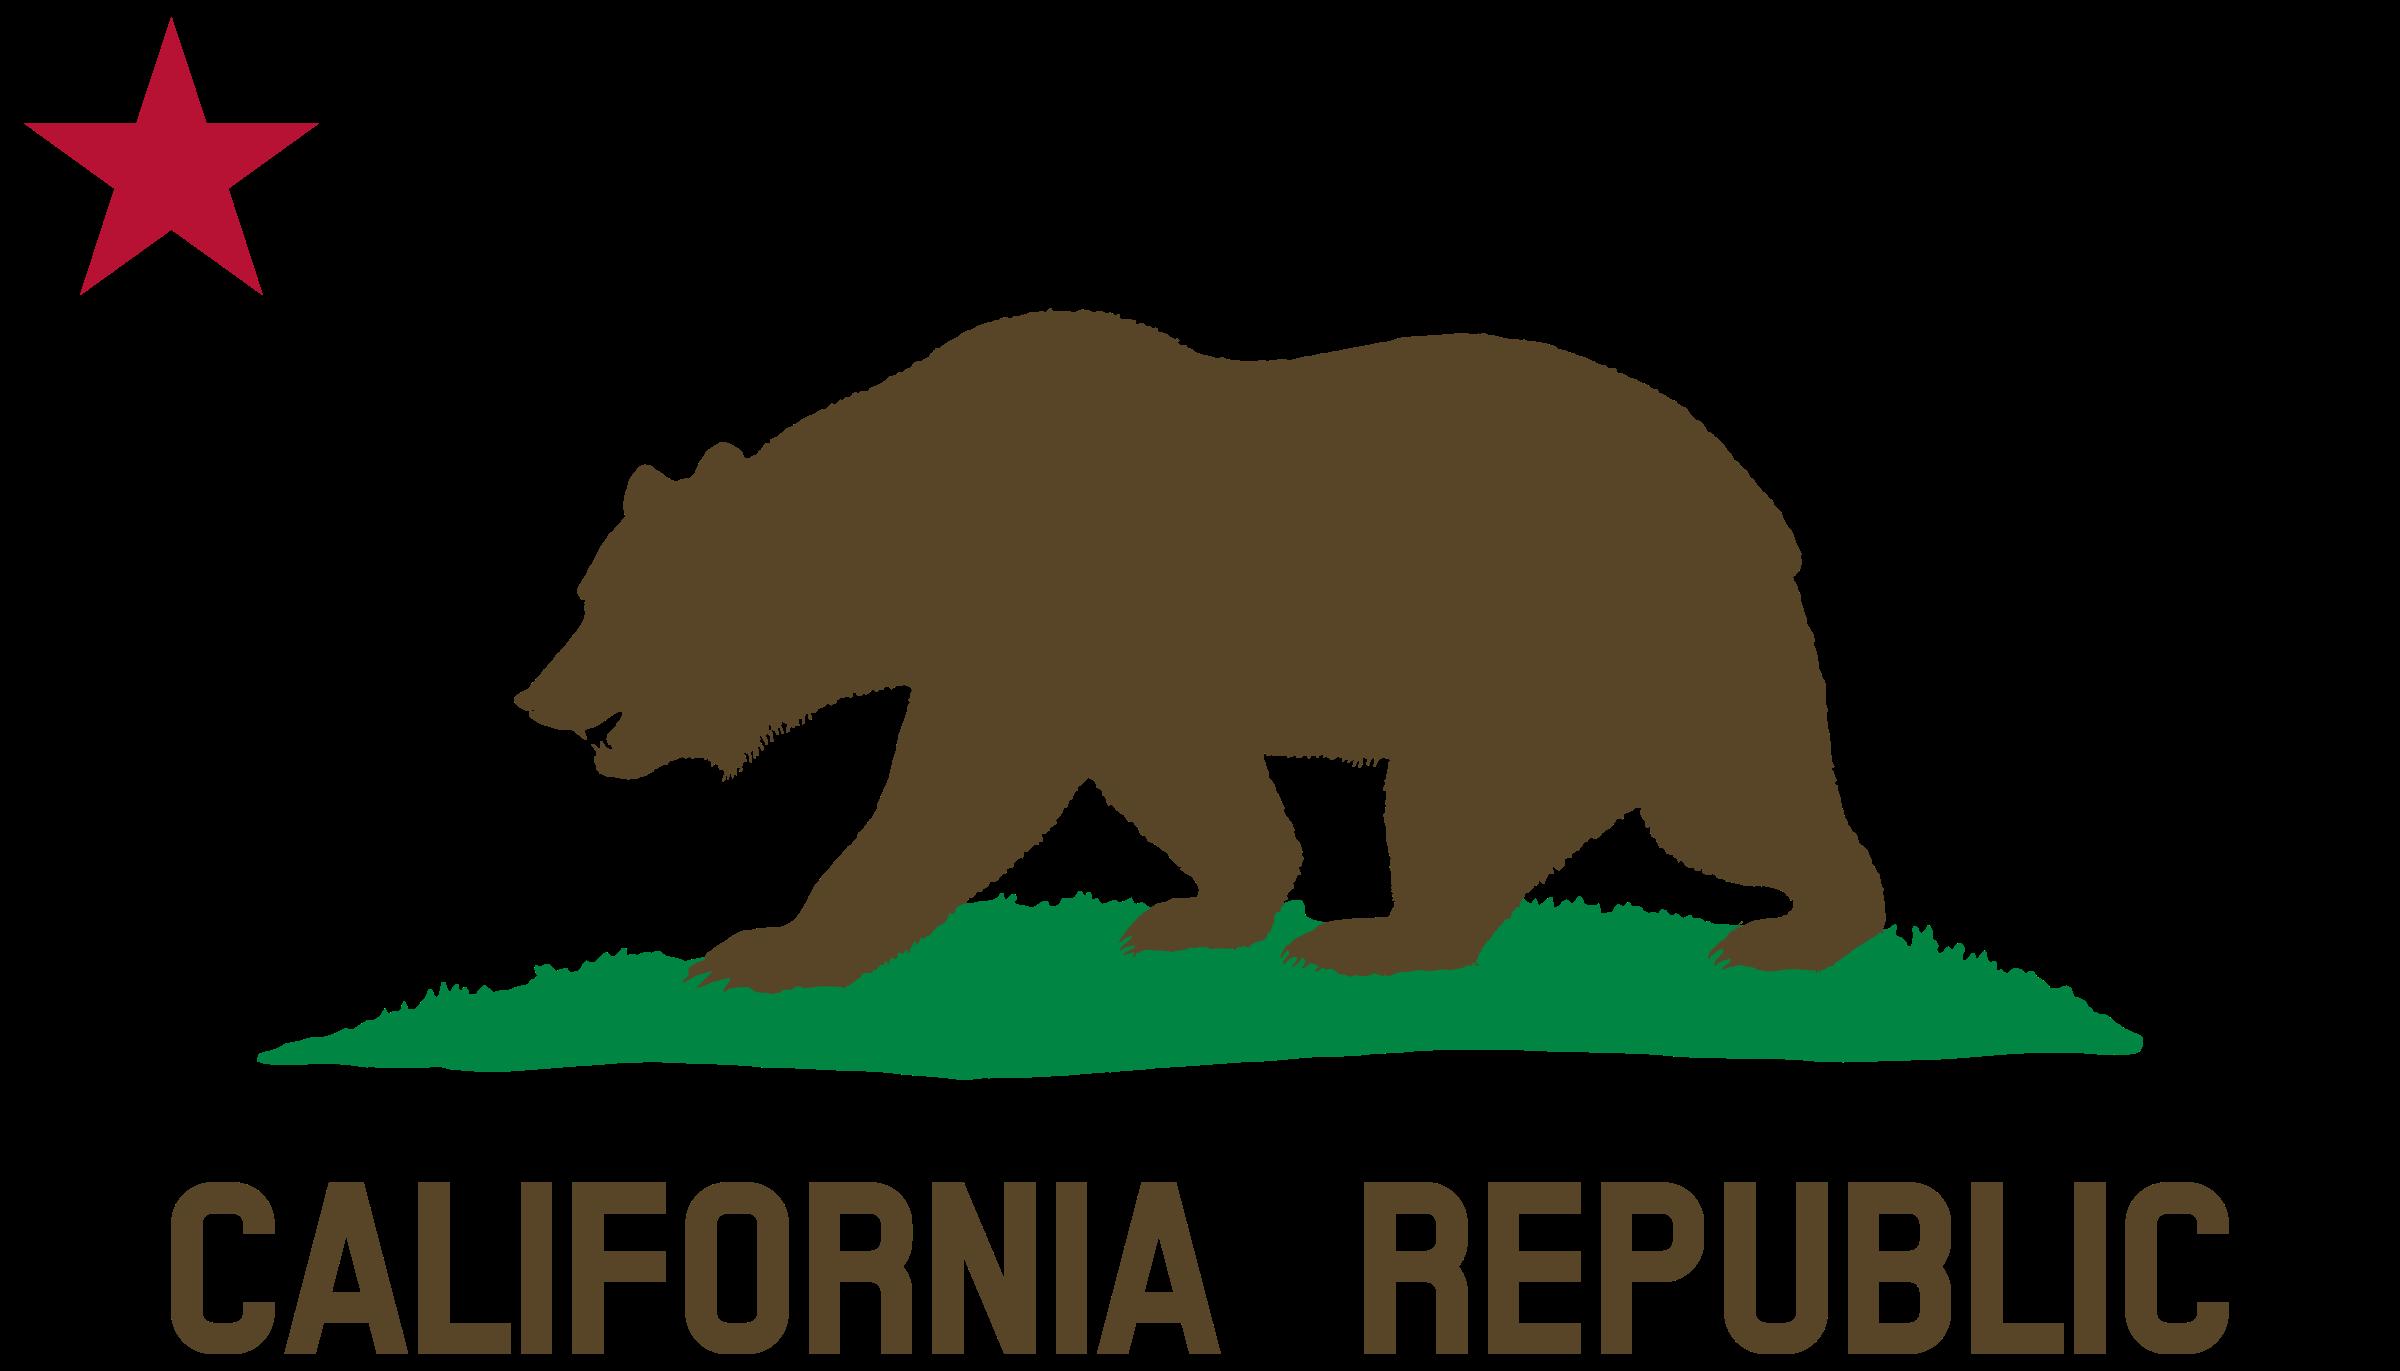 Grizzly Bear clipart california bear Of Plot California Solid) Flag